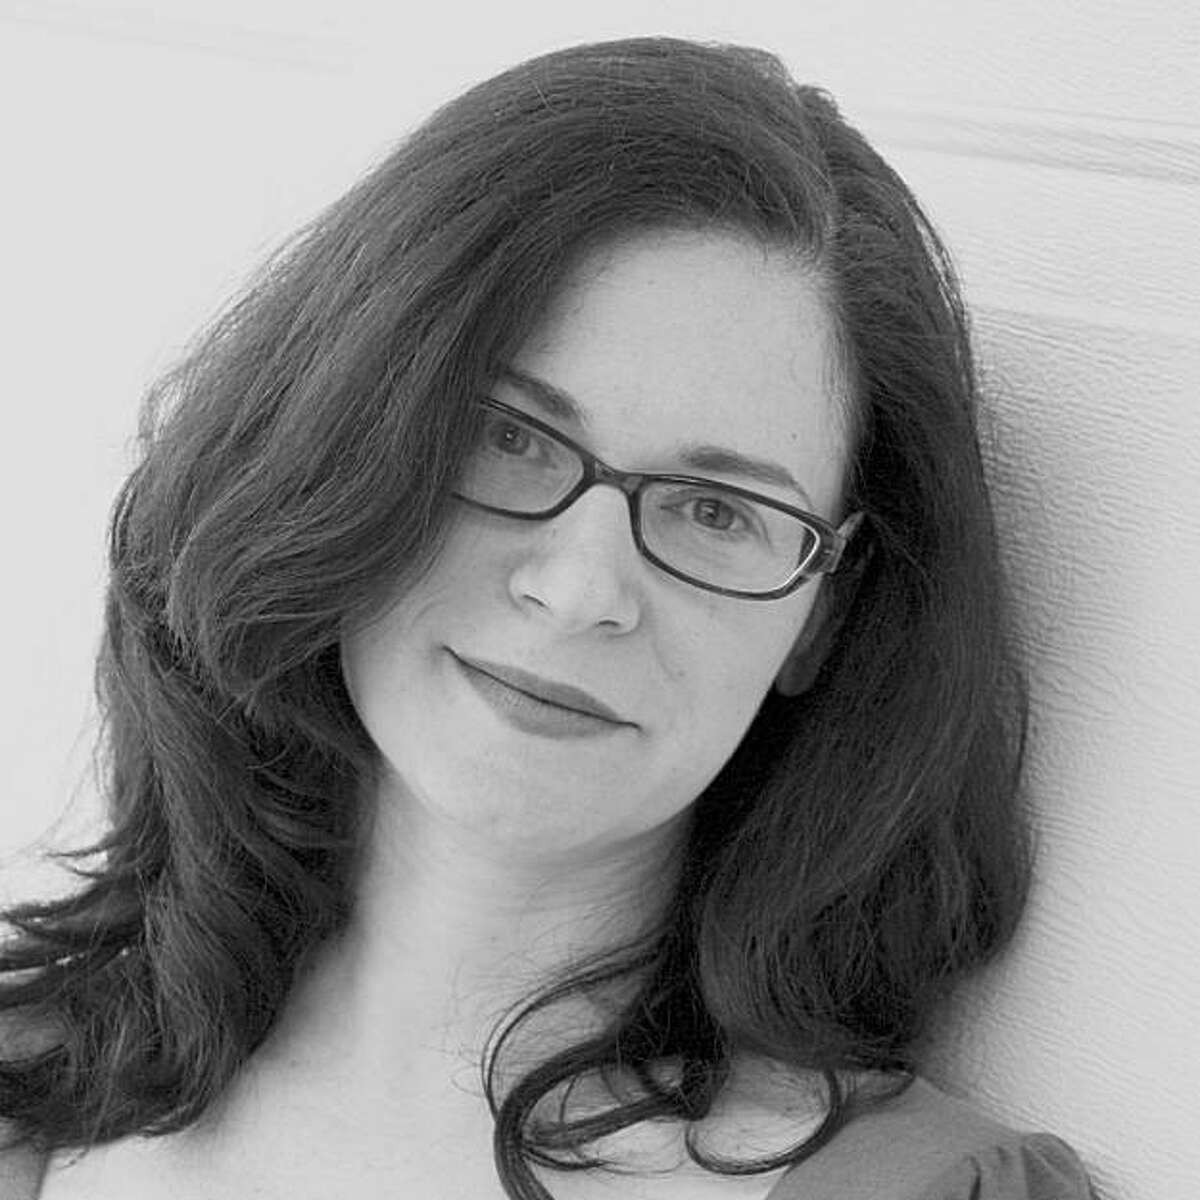 Arika Okrent, author of